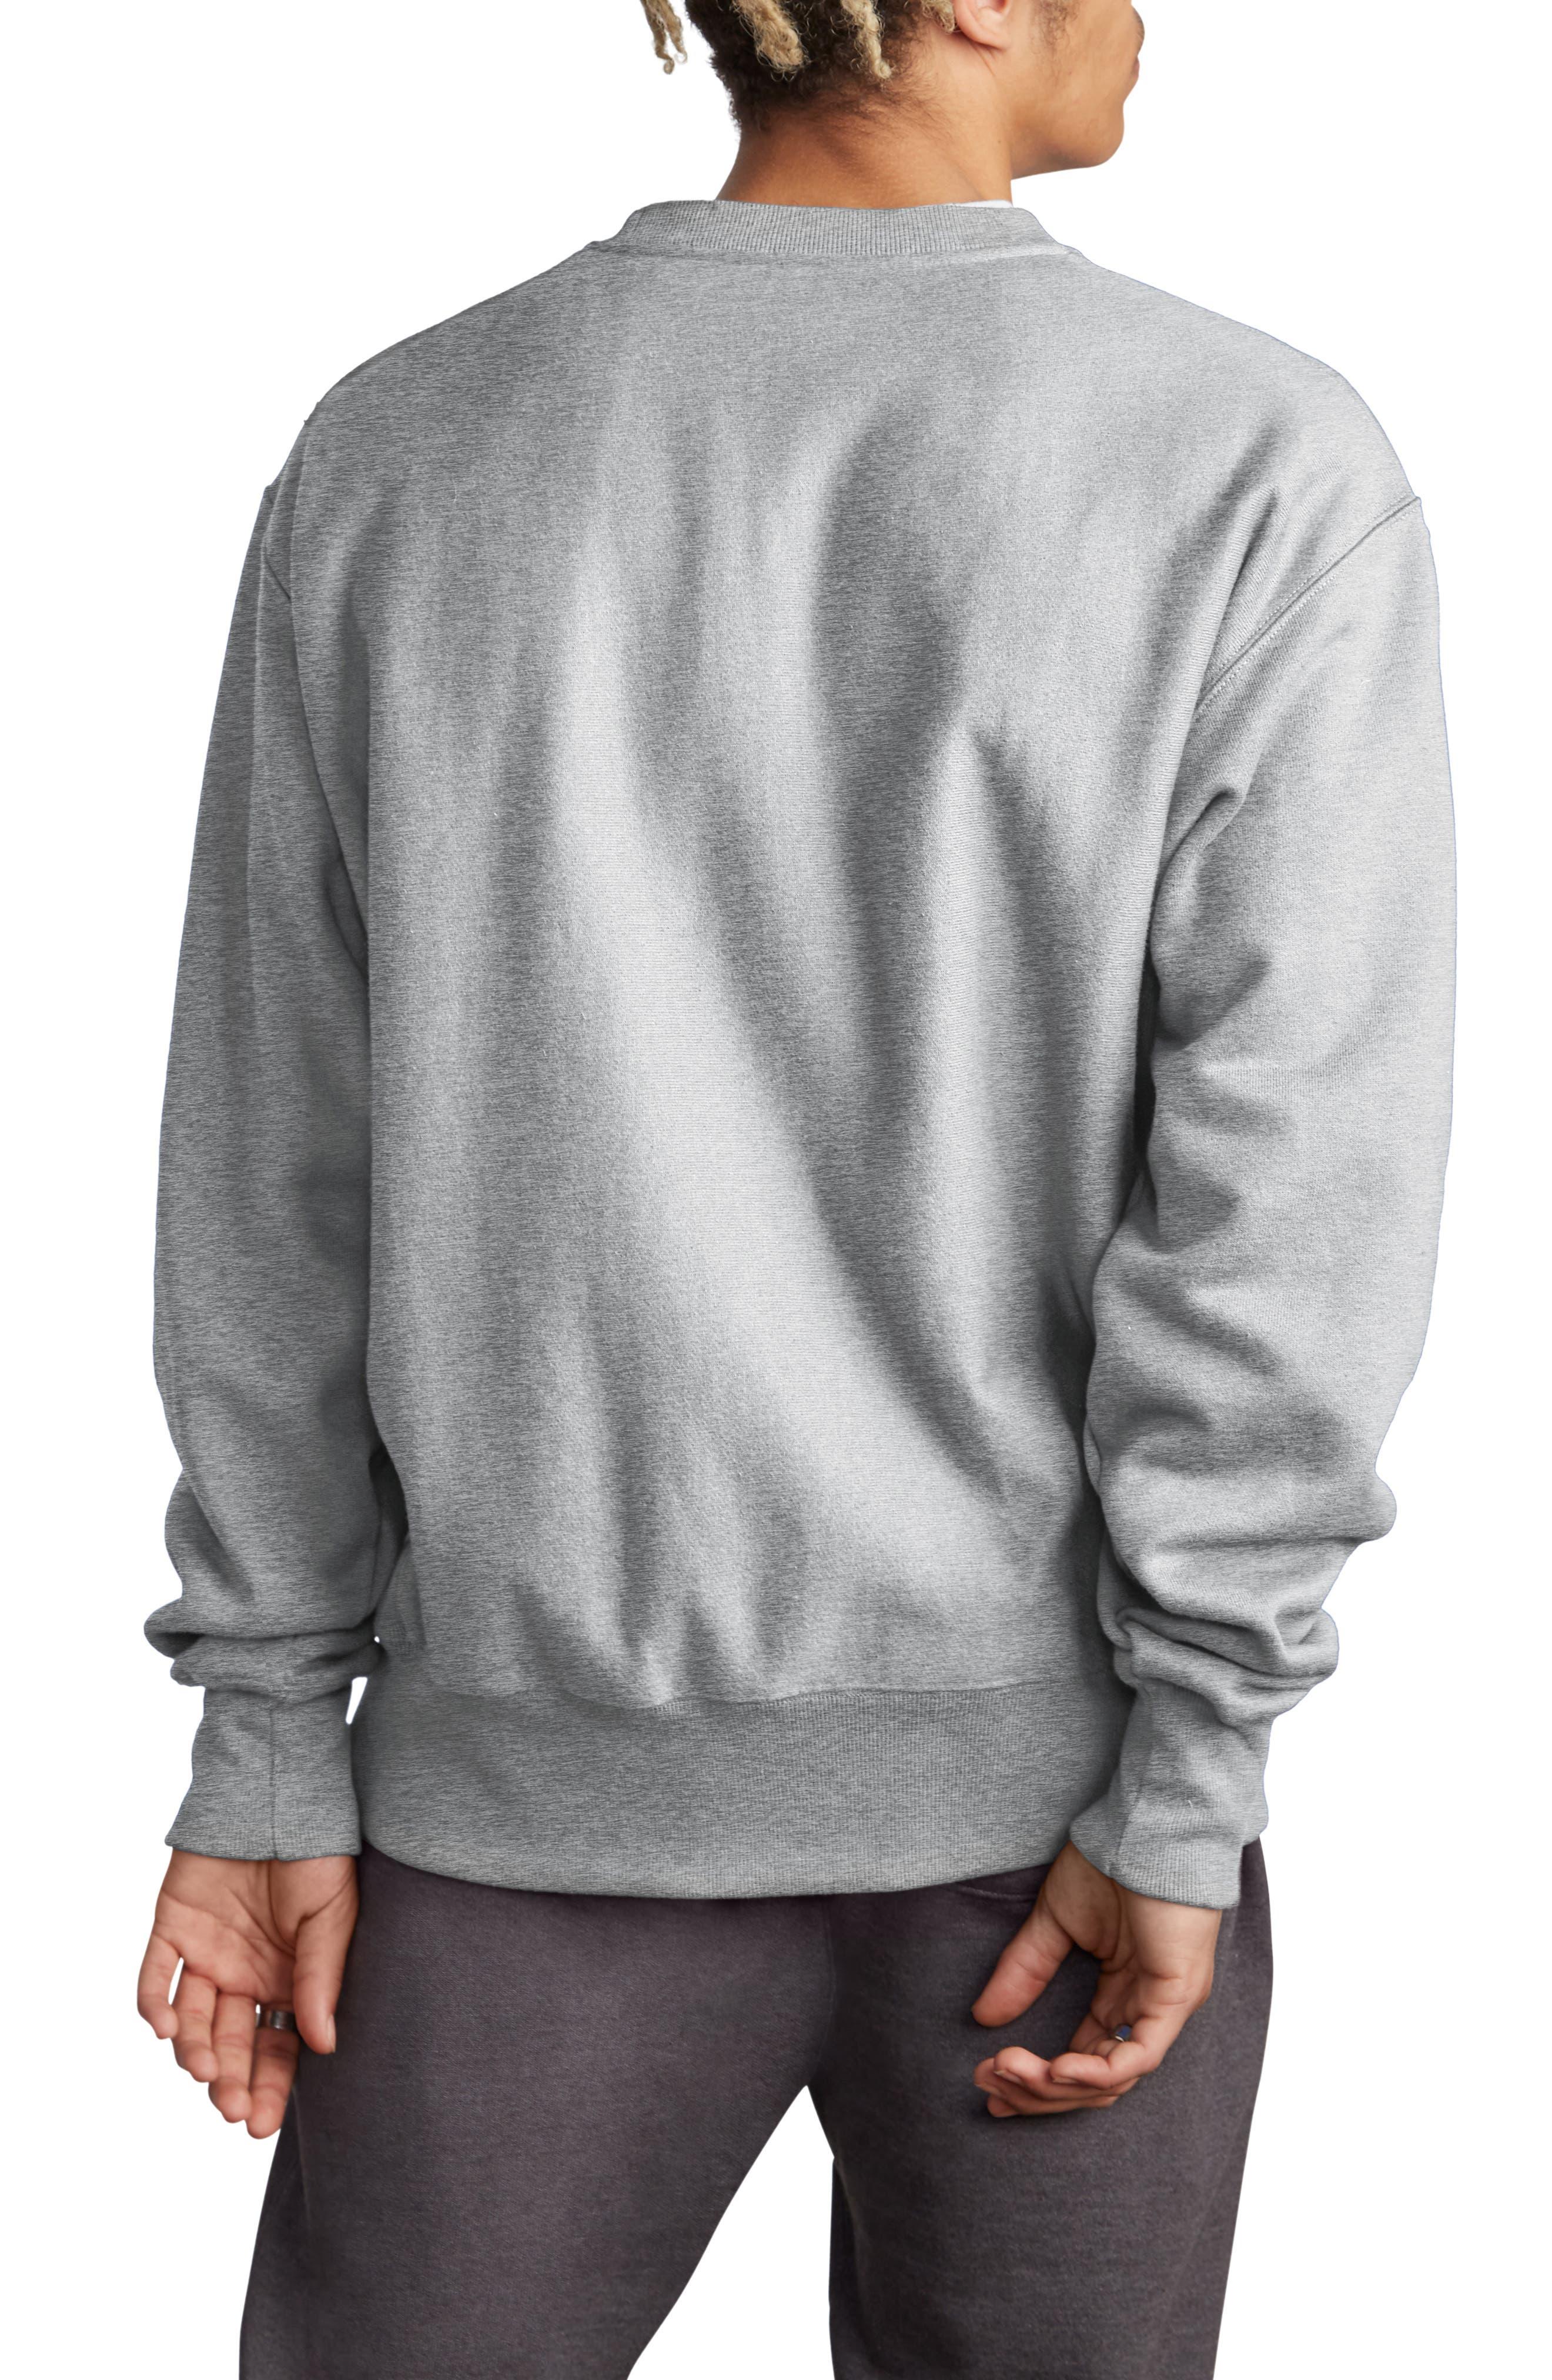 CHAMPION, Sublimated Logo Crewneck Sweatshirt, Alternate thumbnail 2, color, OXFORD GREY